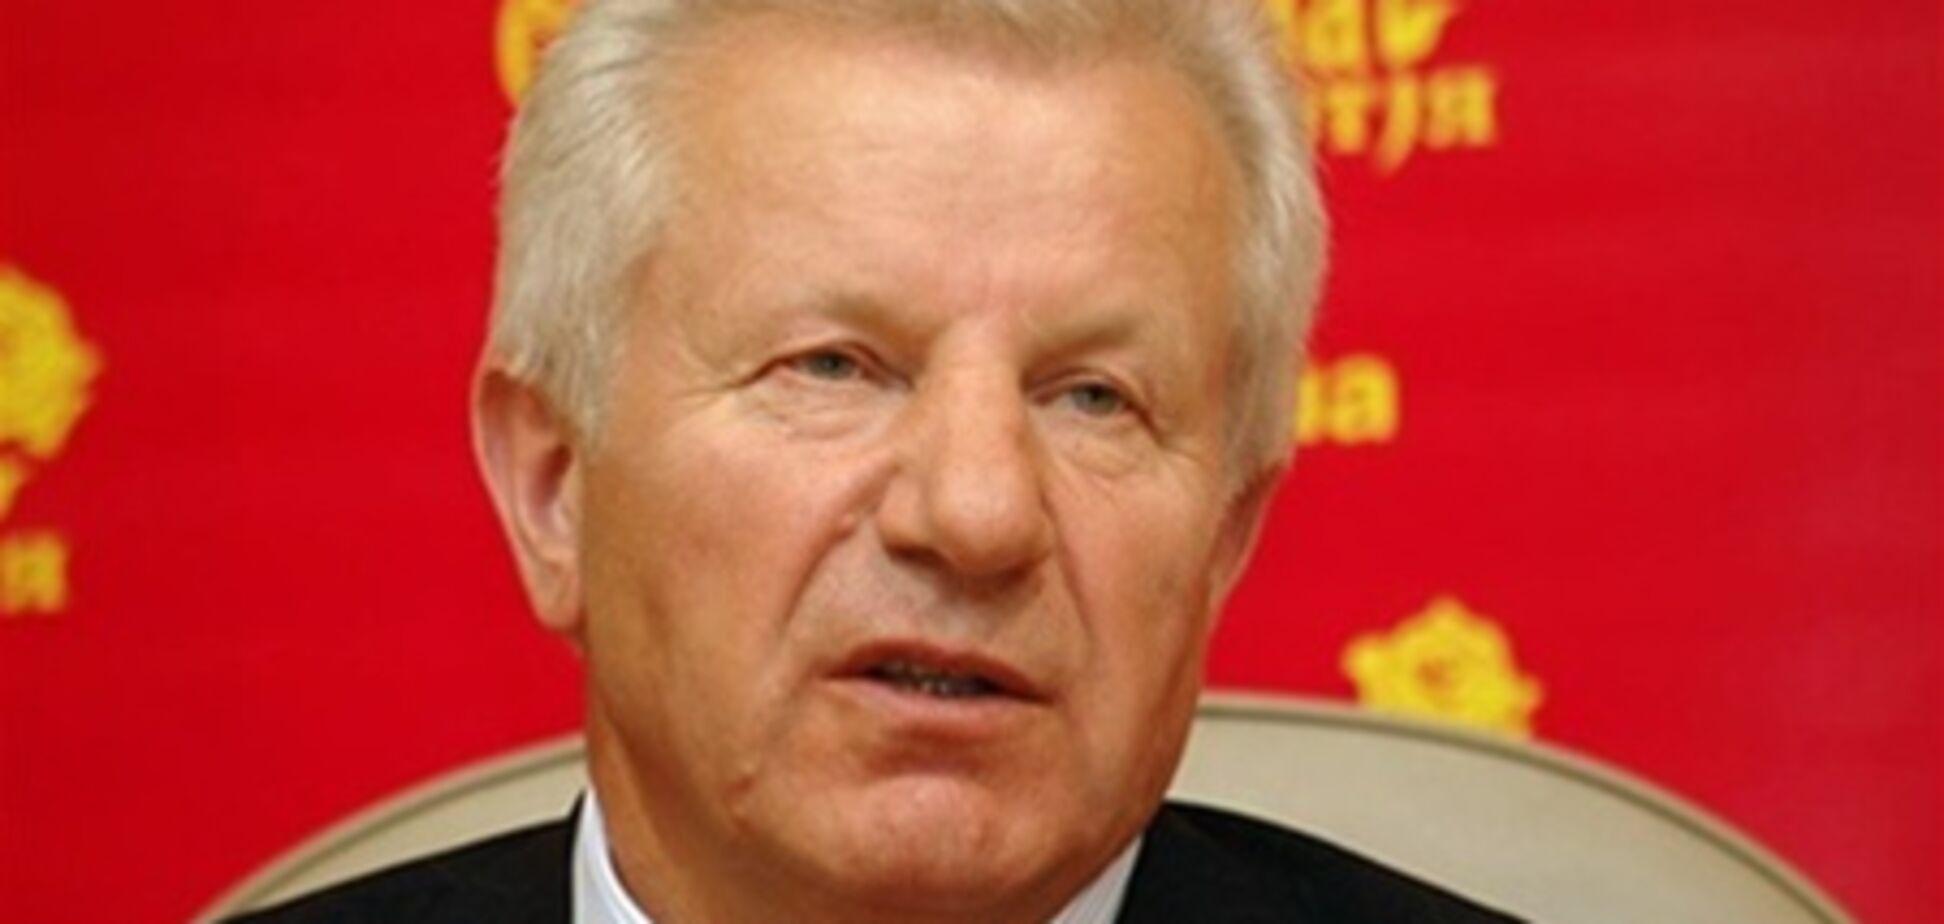 К СПУ присоединилось 5 левоцентристских сил